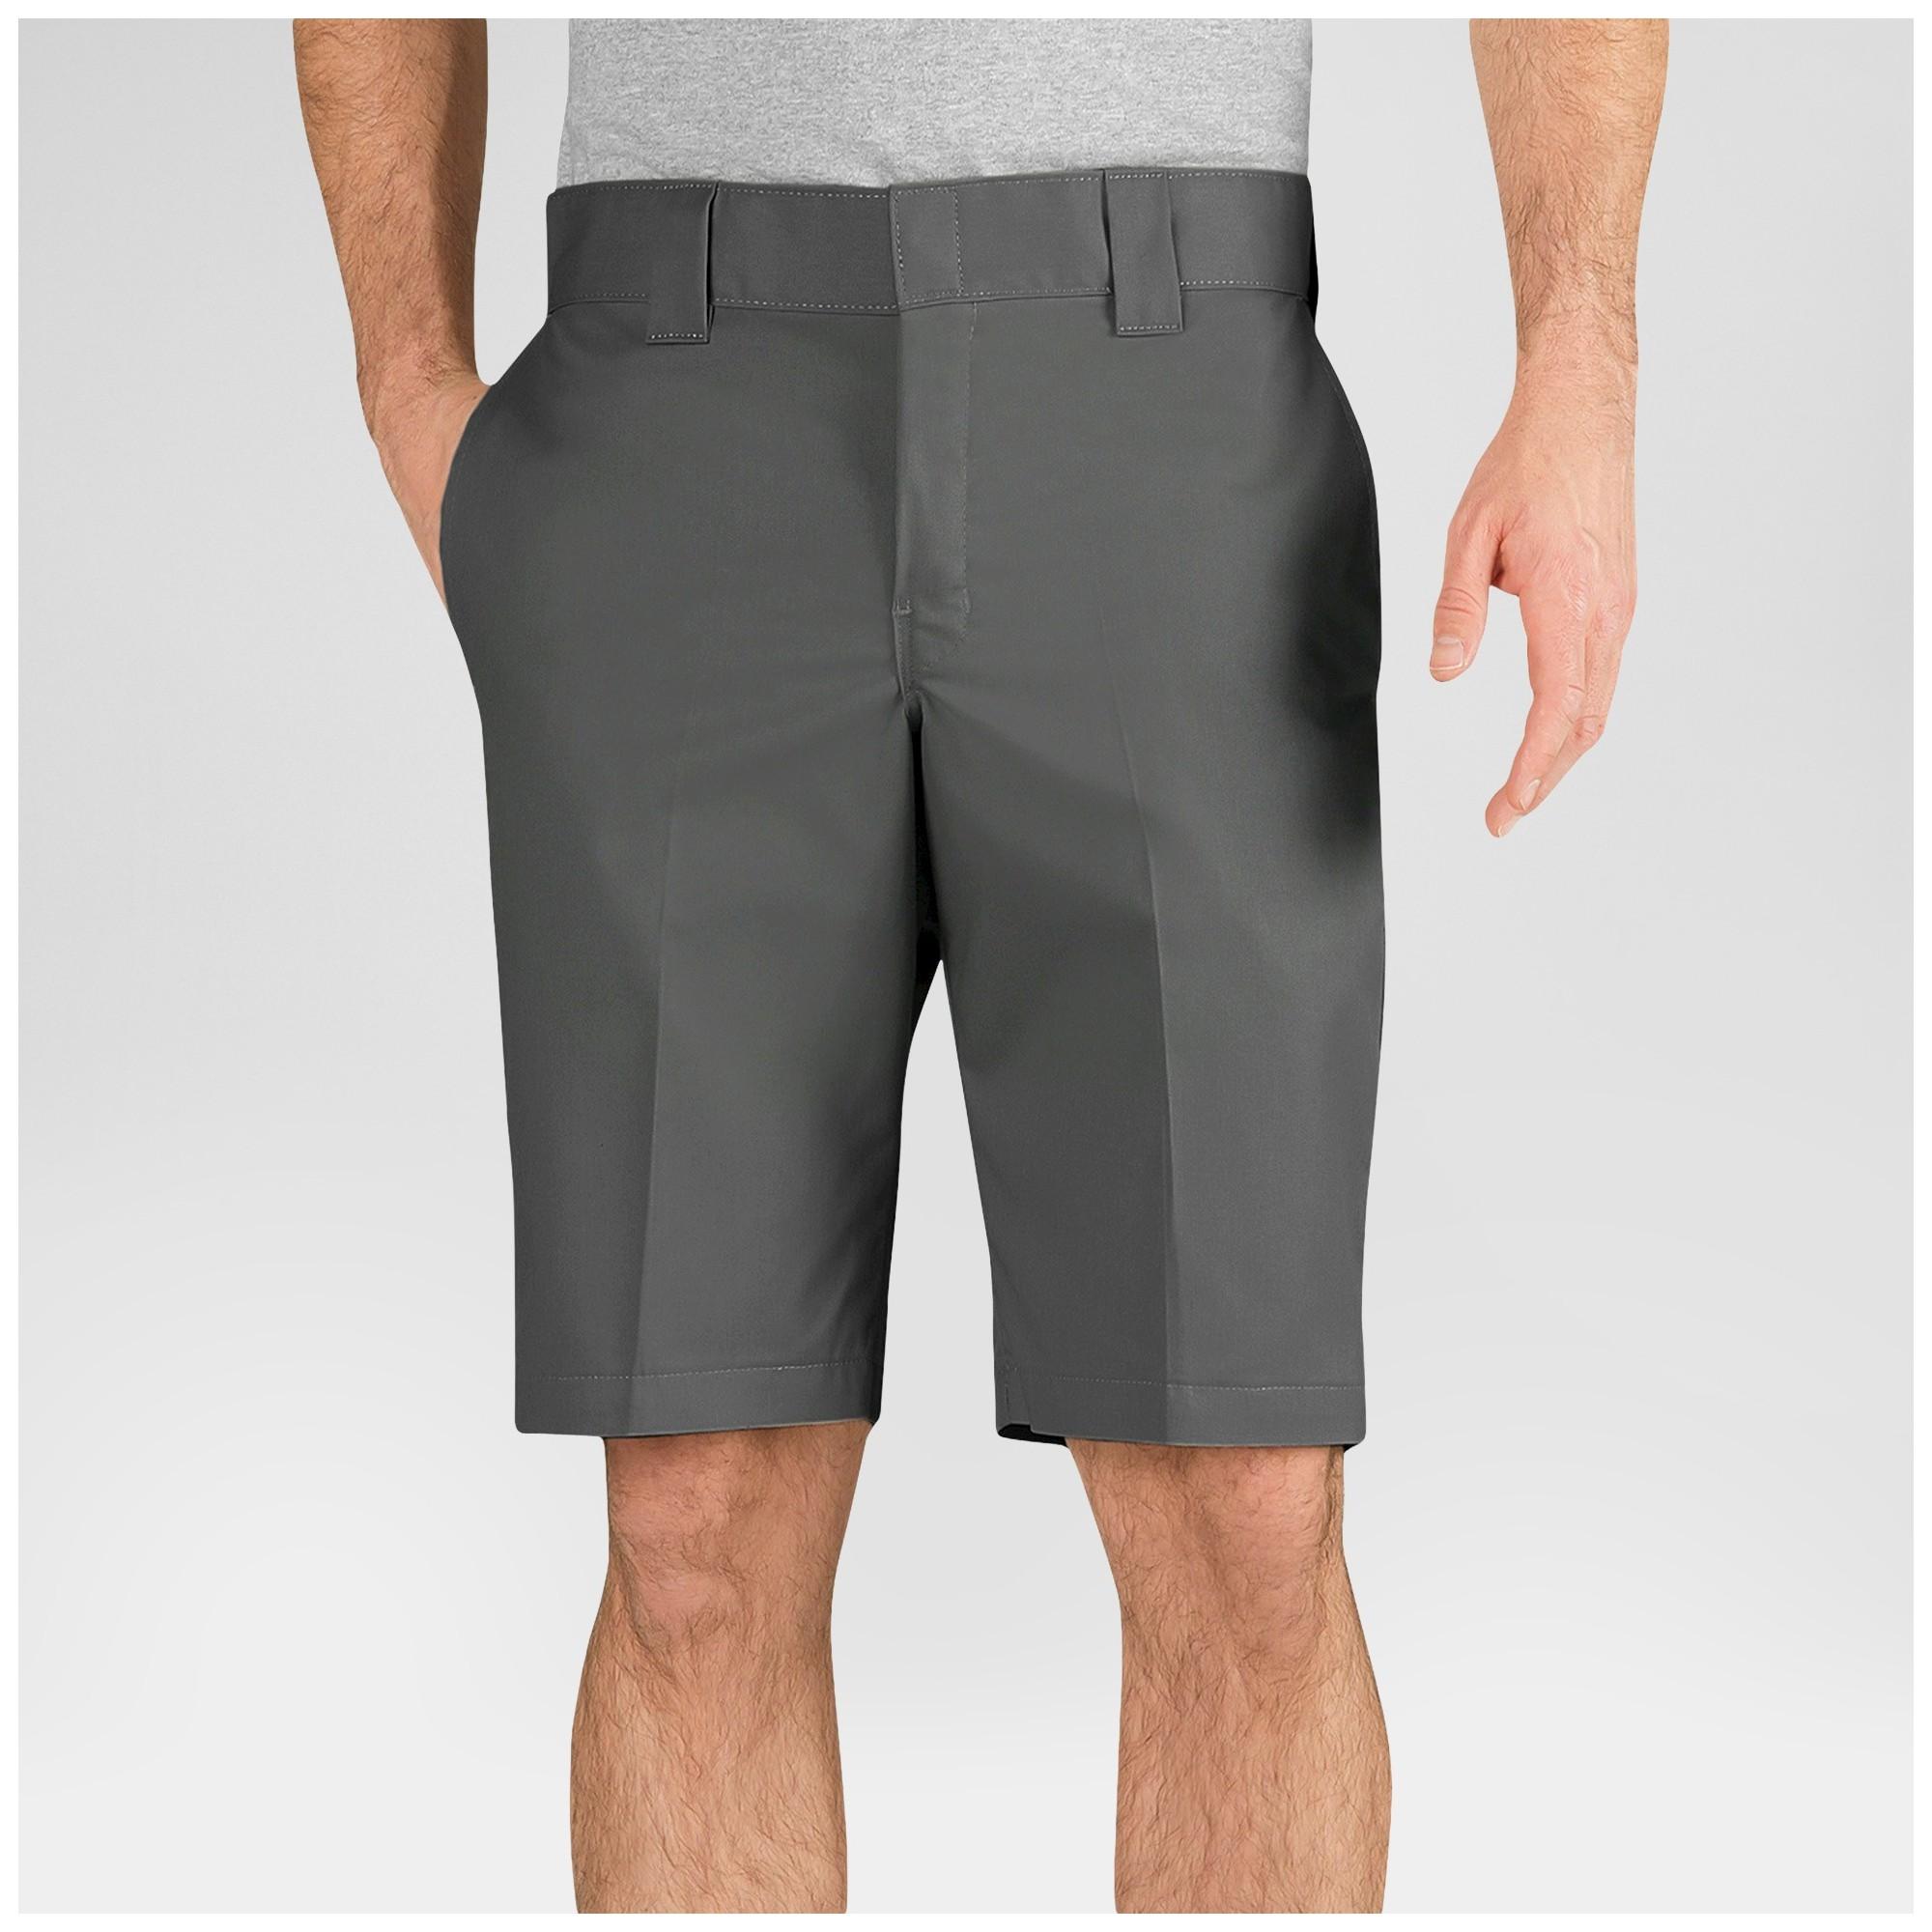 Dickies Men's Slim Fit Flex Twill 11 Shorts- Gravel Gray 26